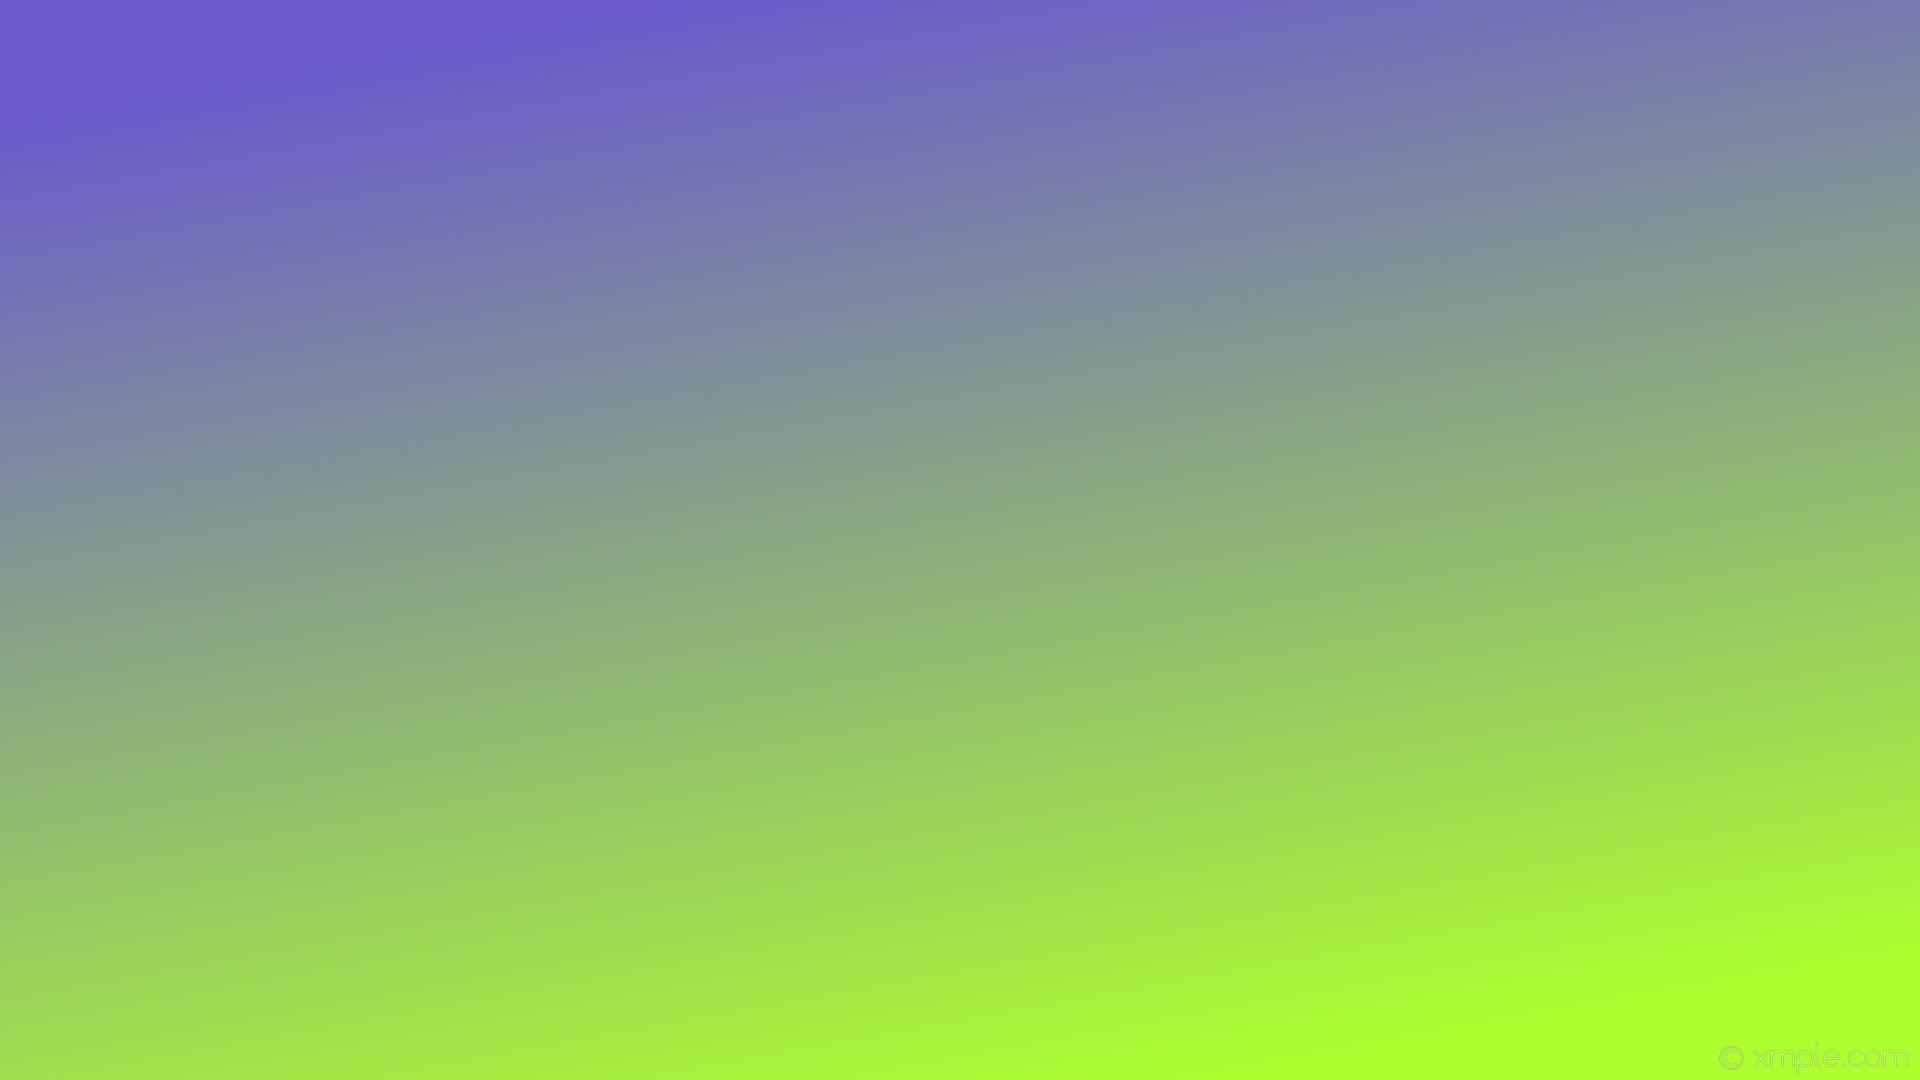 wallpaper green linear gradient purple green yellow slate blue #adff2f  #6a5acd 300°